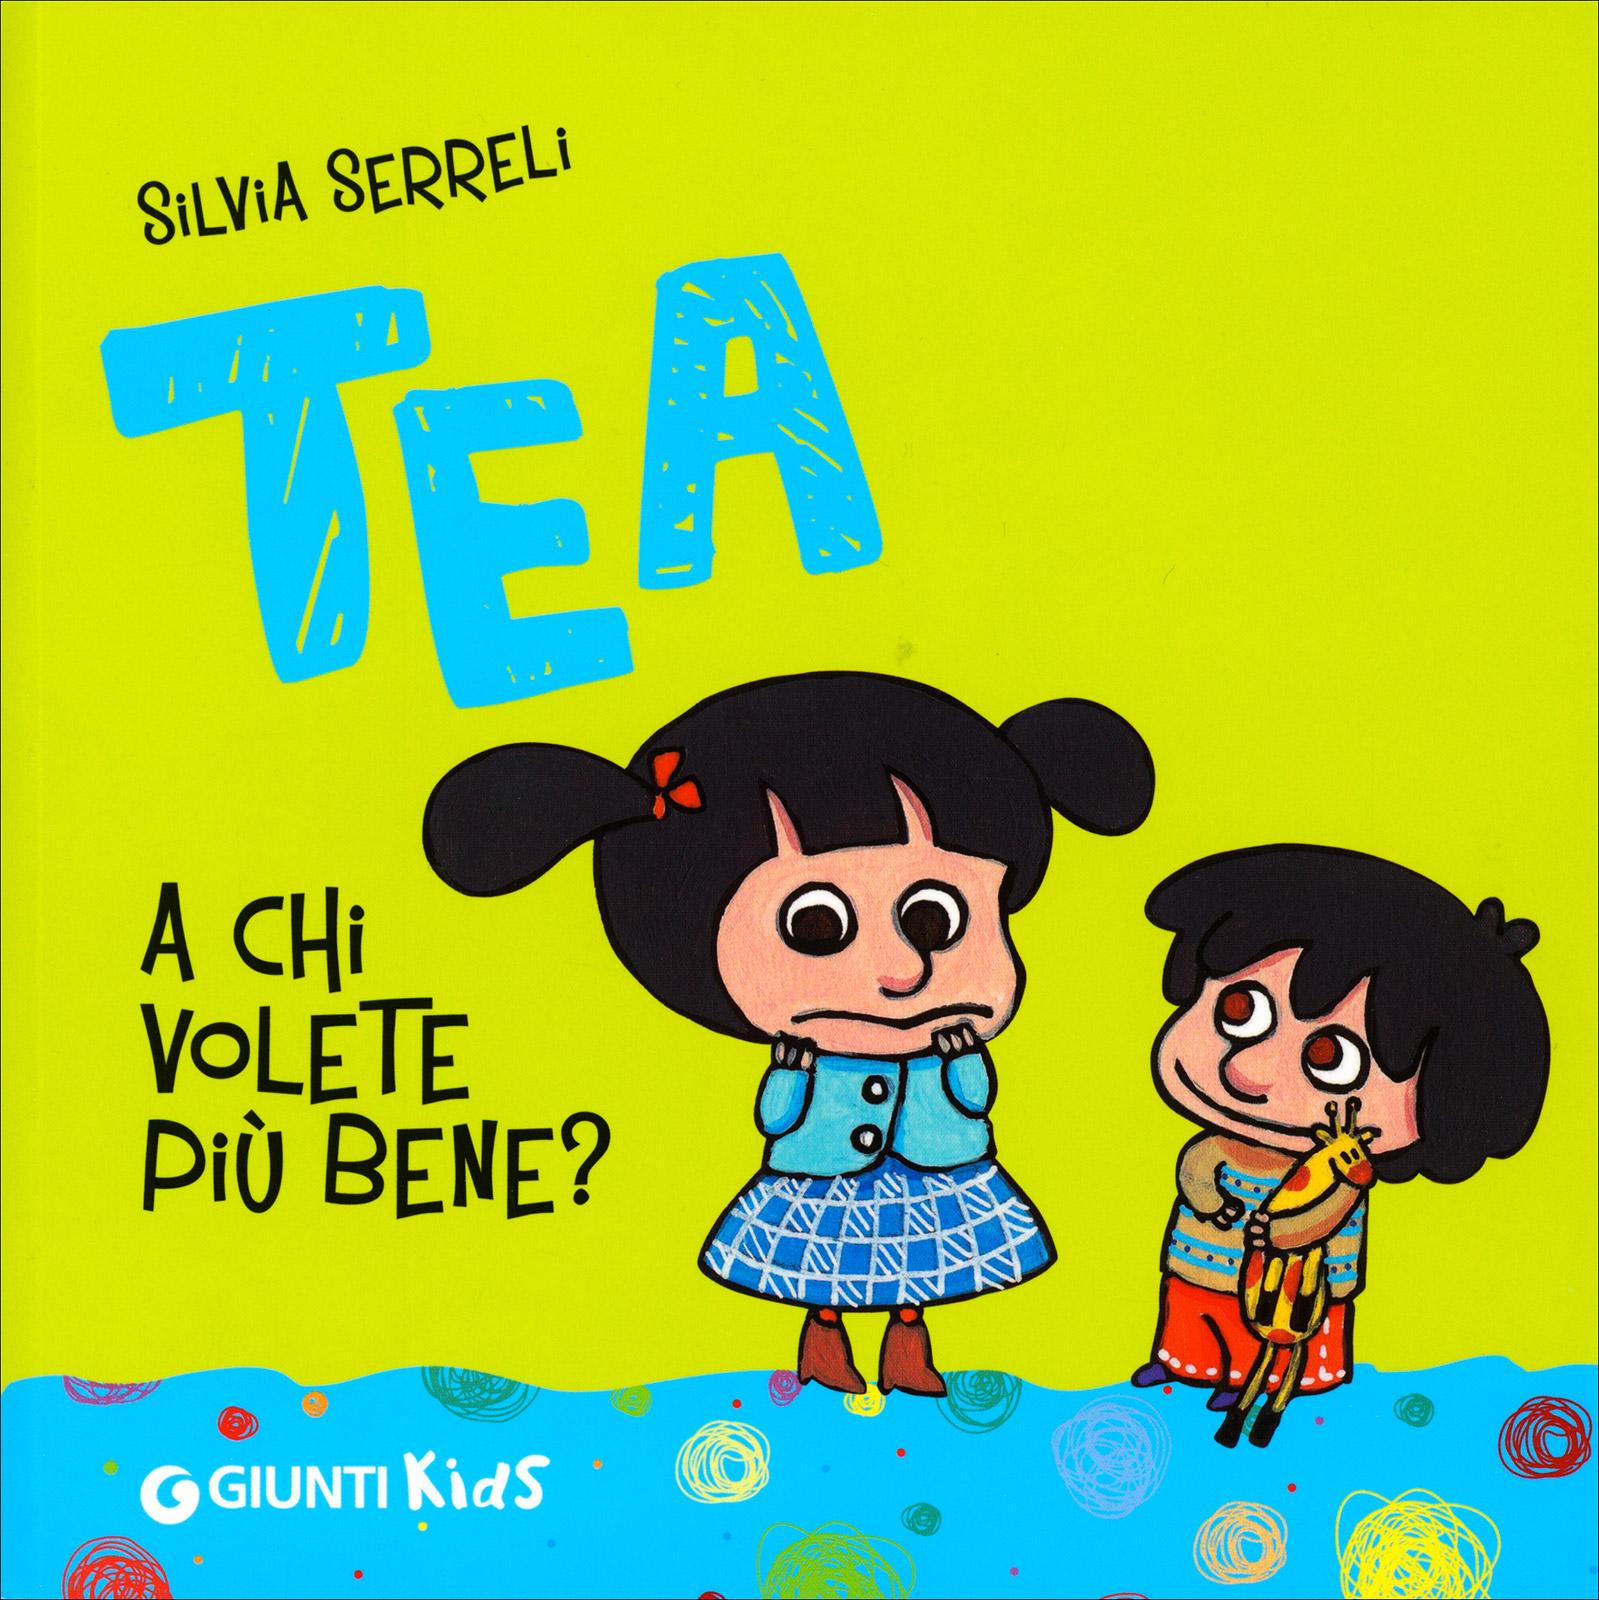 E Se Non Ci Riesco Tea Wiring Library Epiphone Special Sg G310 Diagram A Chi Volete Pi Bene Silvia Serreli Libro